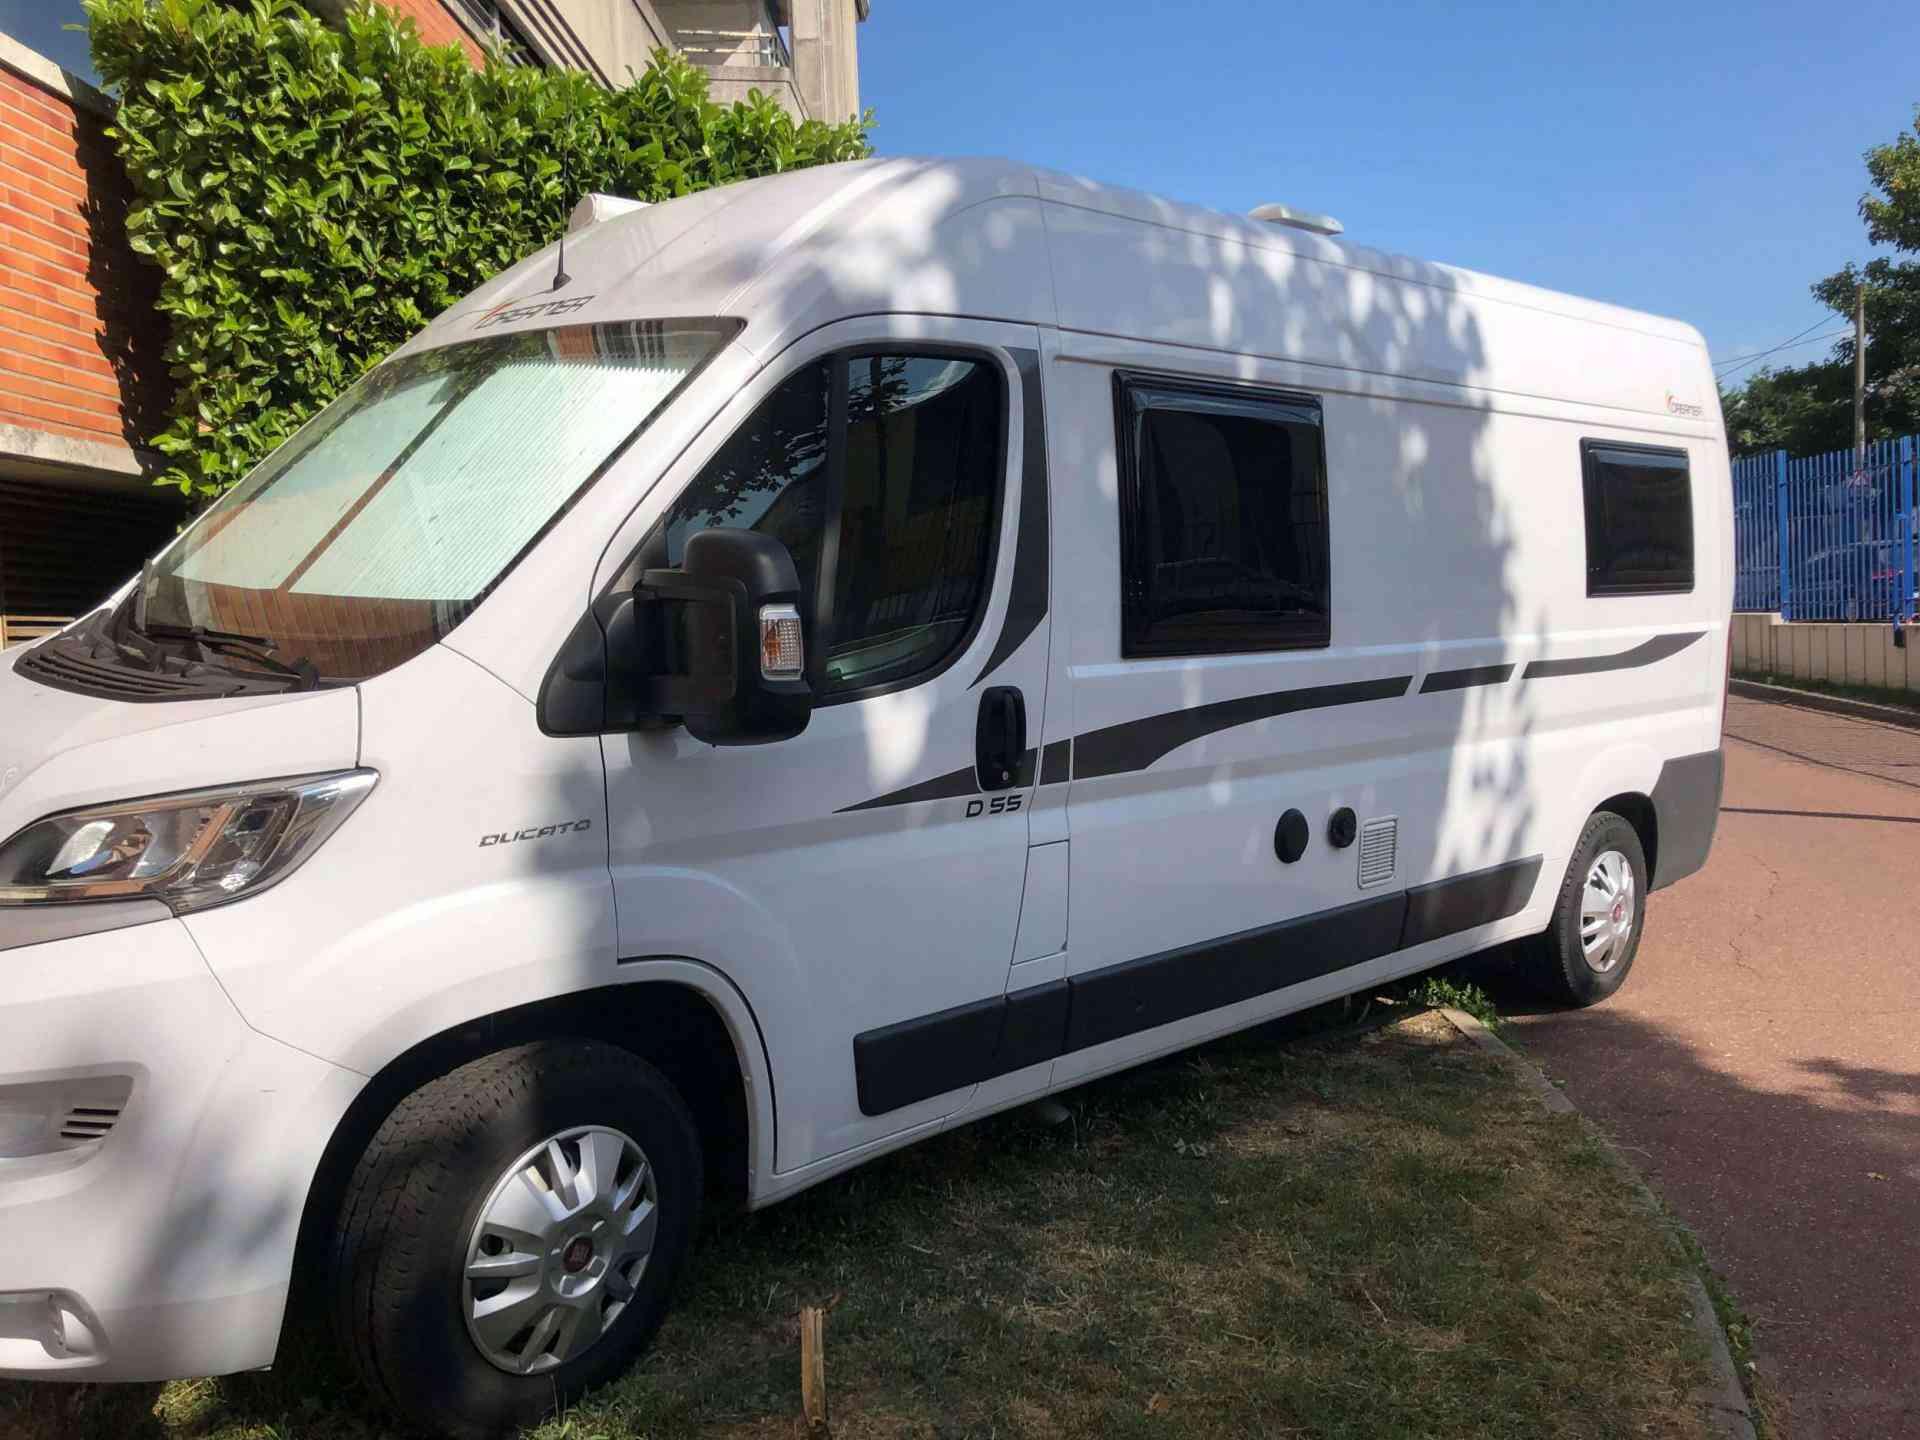 camping-car DREAMER D55